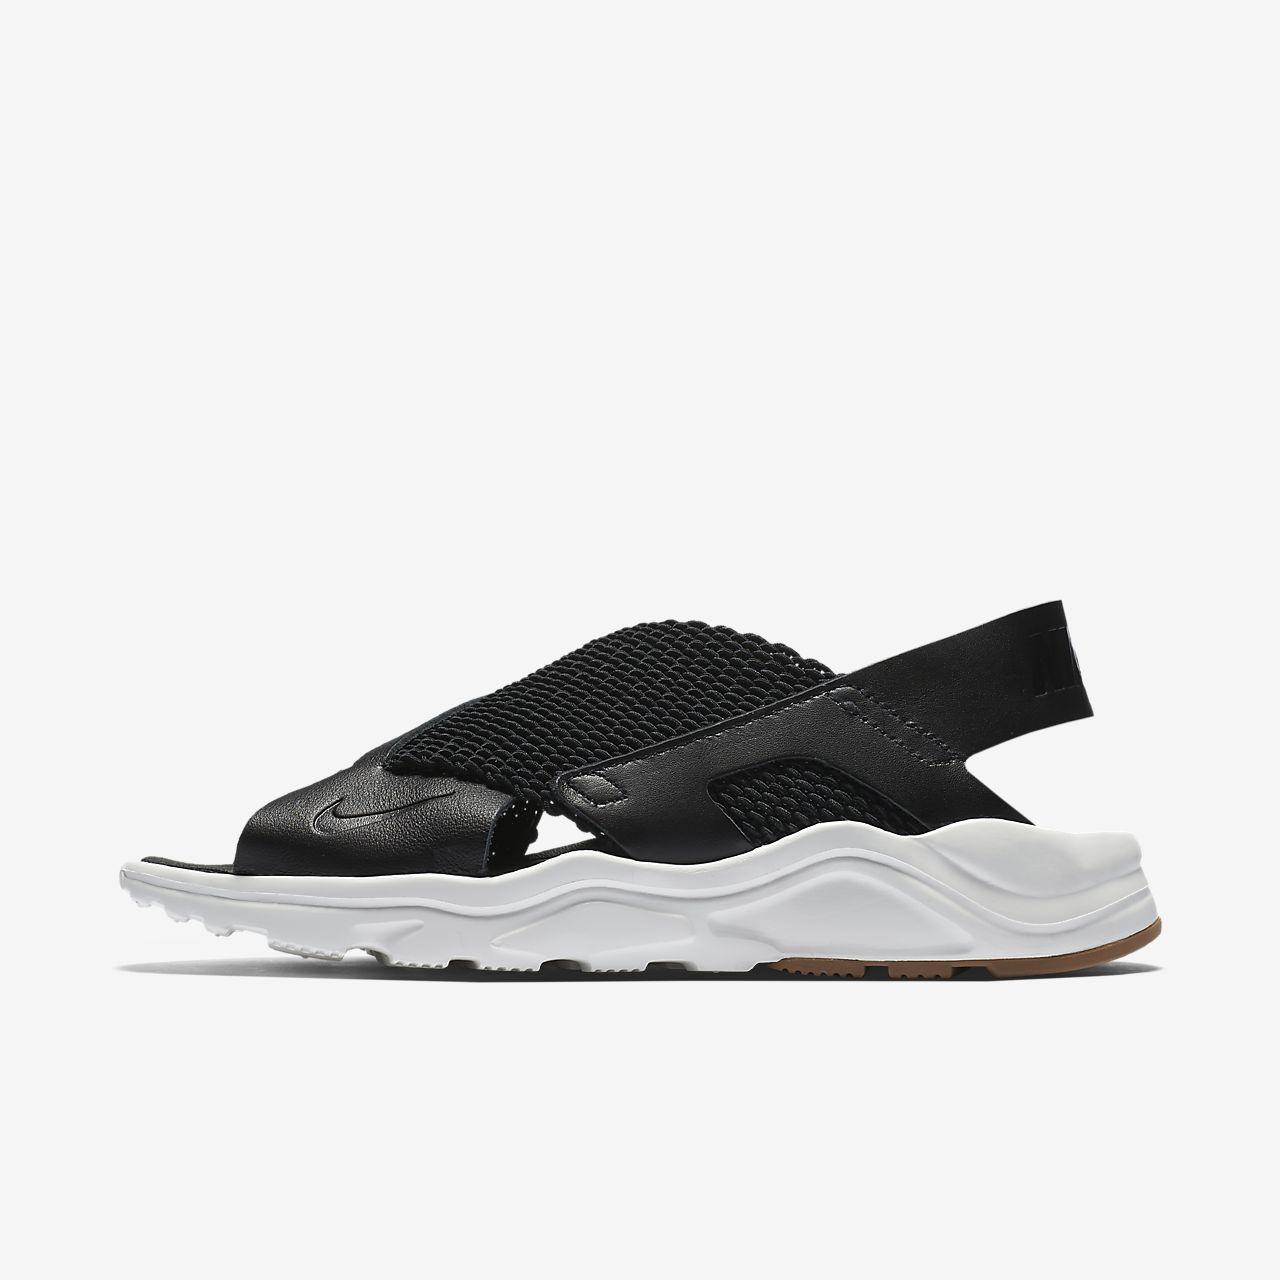 Nike ACG - Sandalias para mujer, color marrón, talla 38